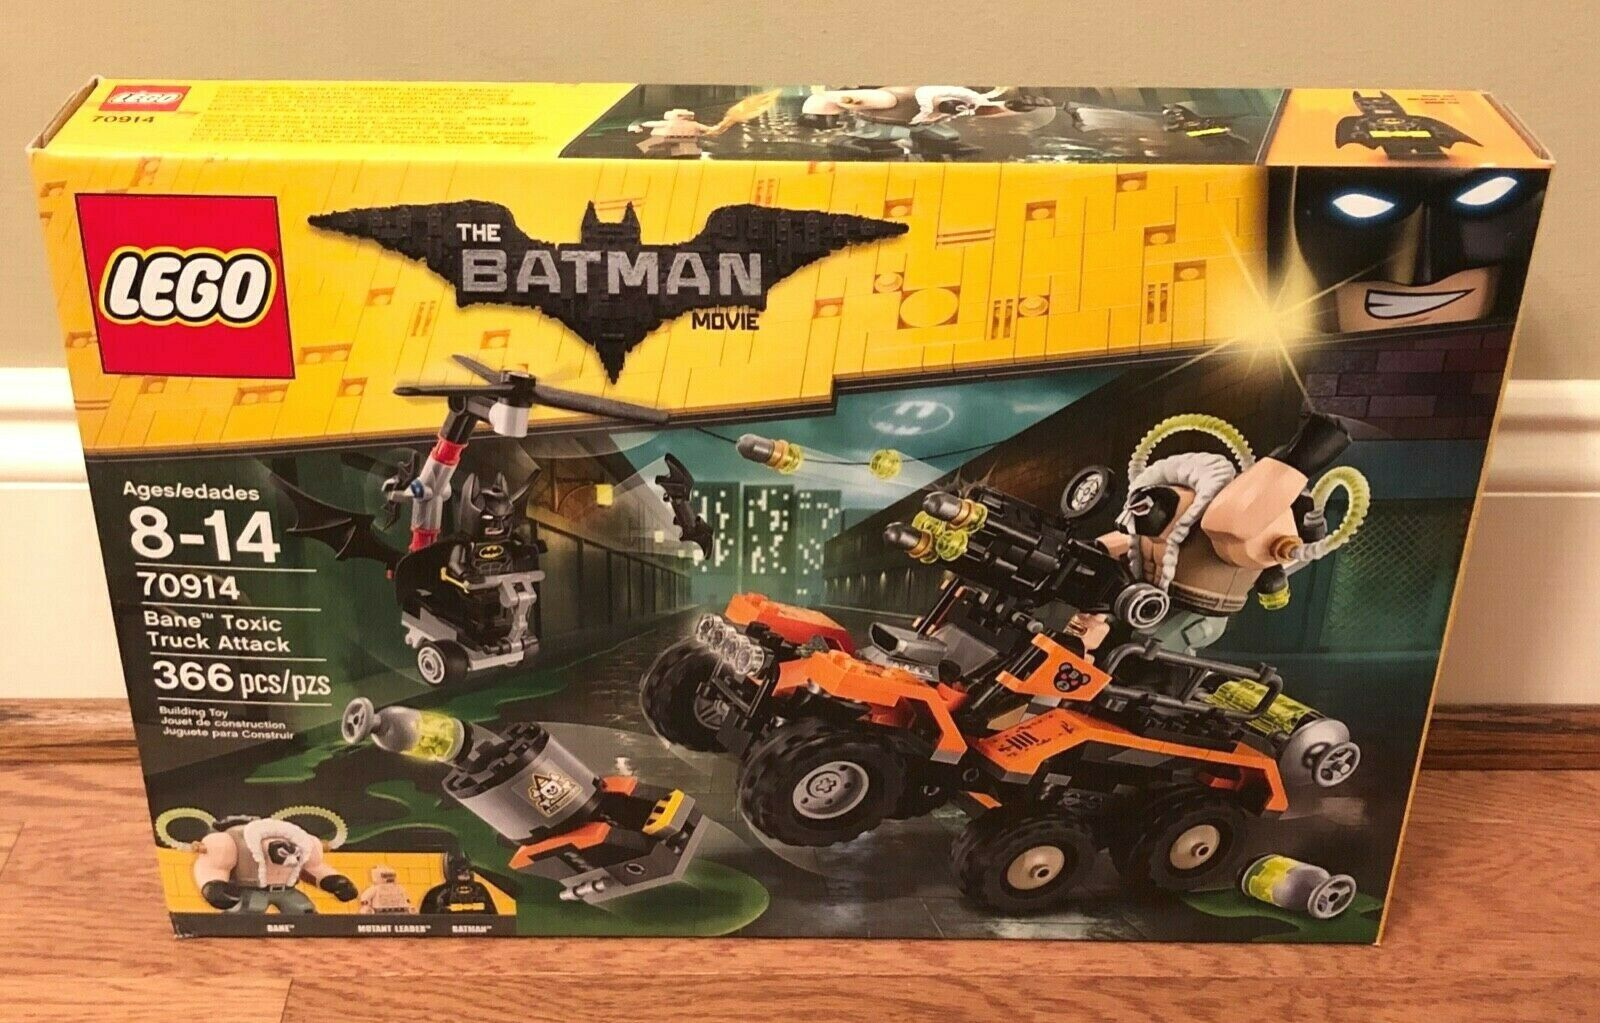 Lego The Batman Movie 70914 Bane Toxic Truck Attack 366pcs New Sealed 2017 TLBM